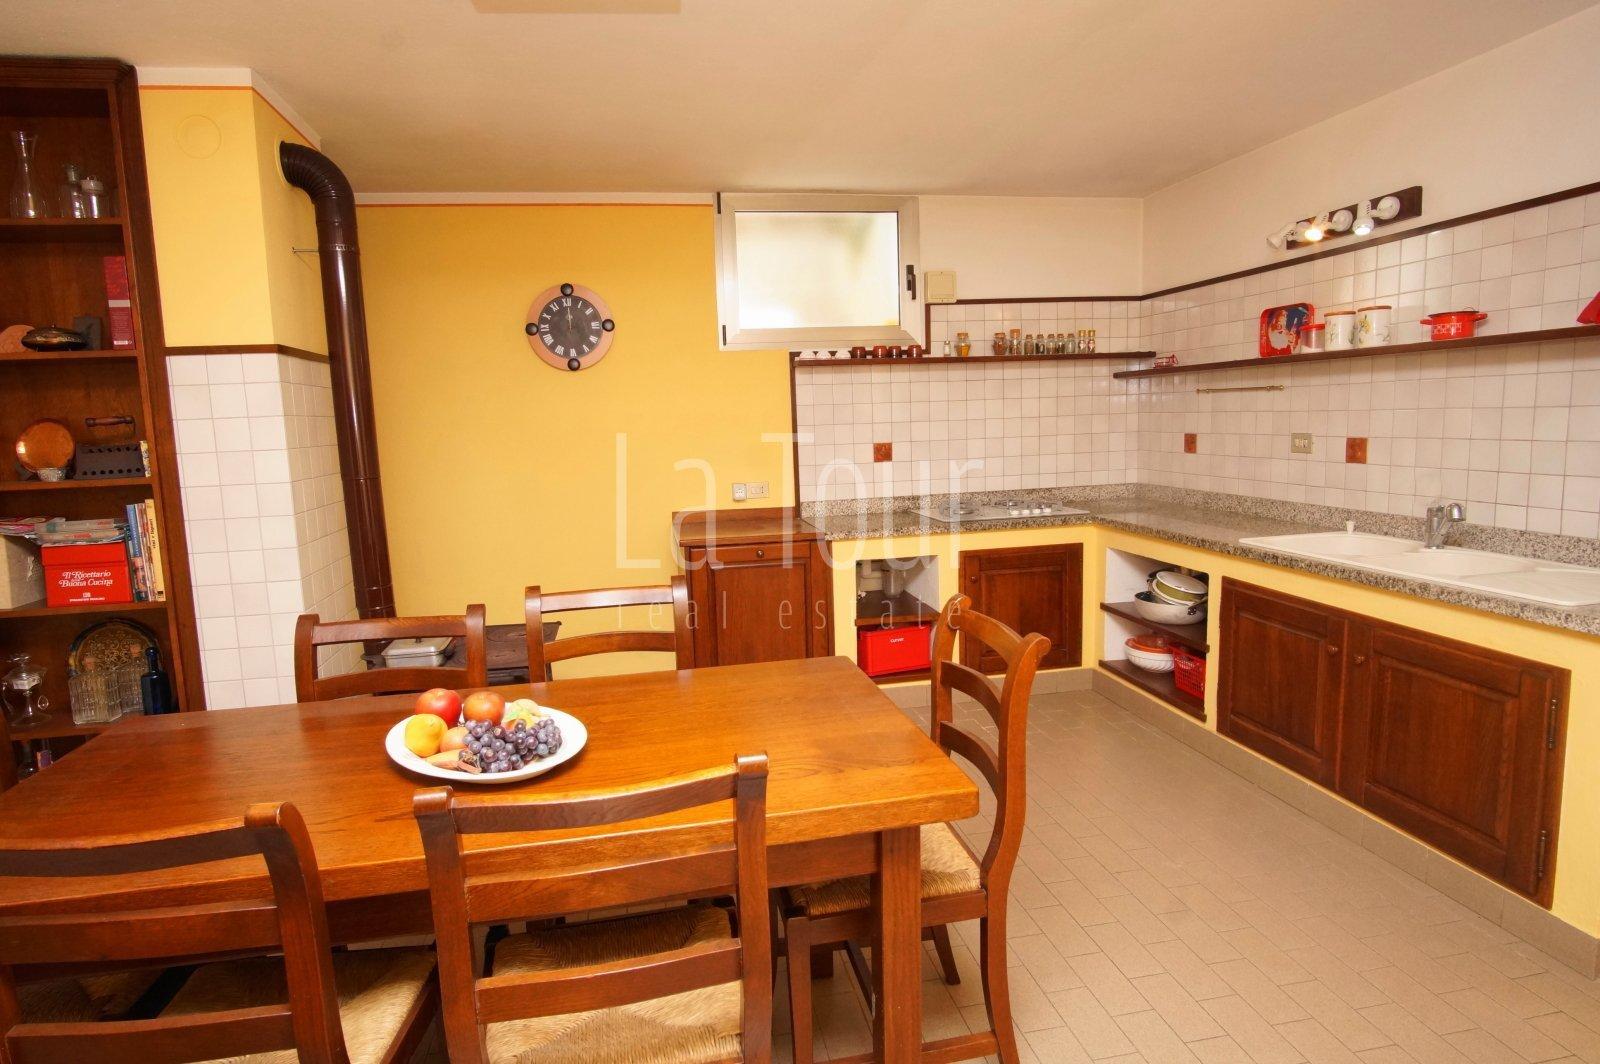 Pontey villetta INSP Villa one-family